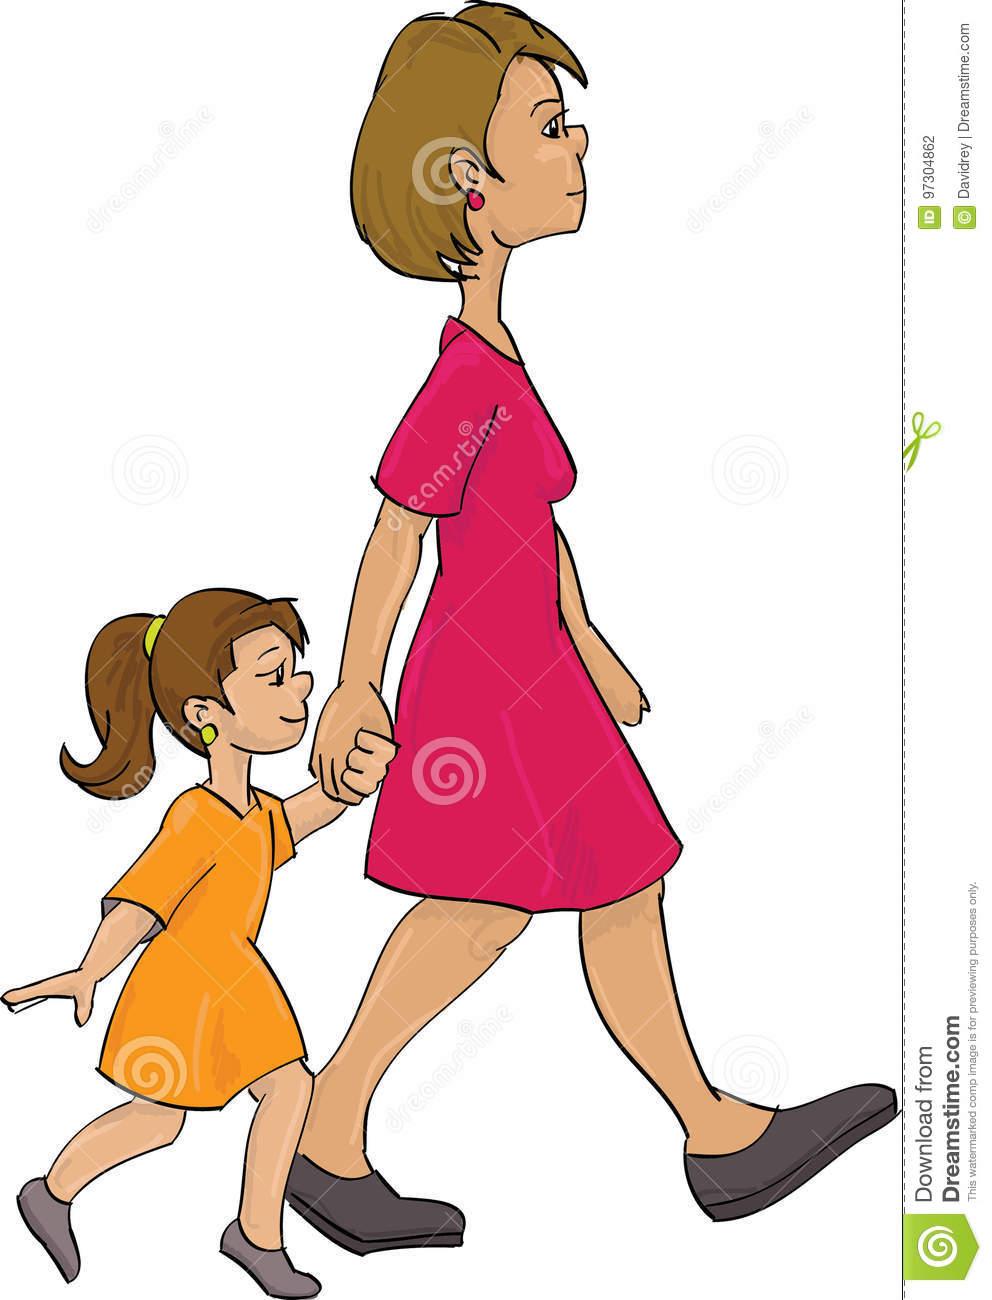 Mother and child walking stock illustration. Illustration of child.